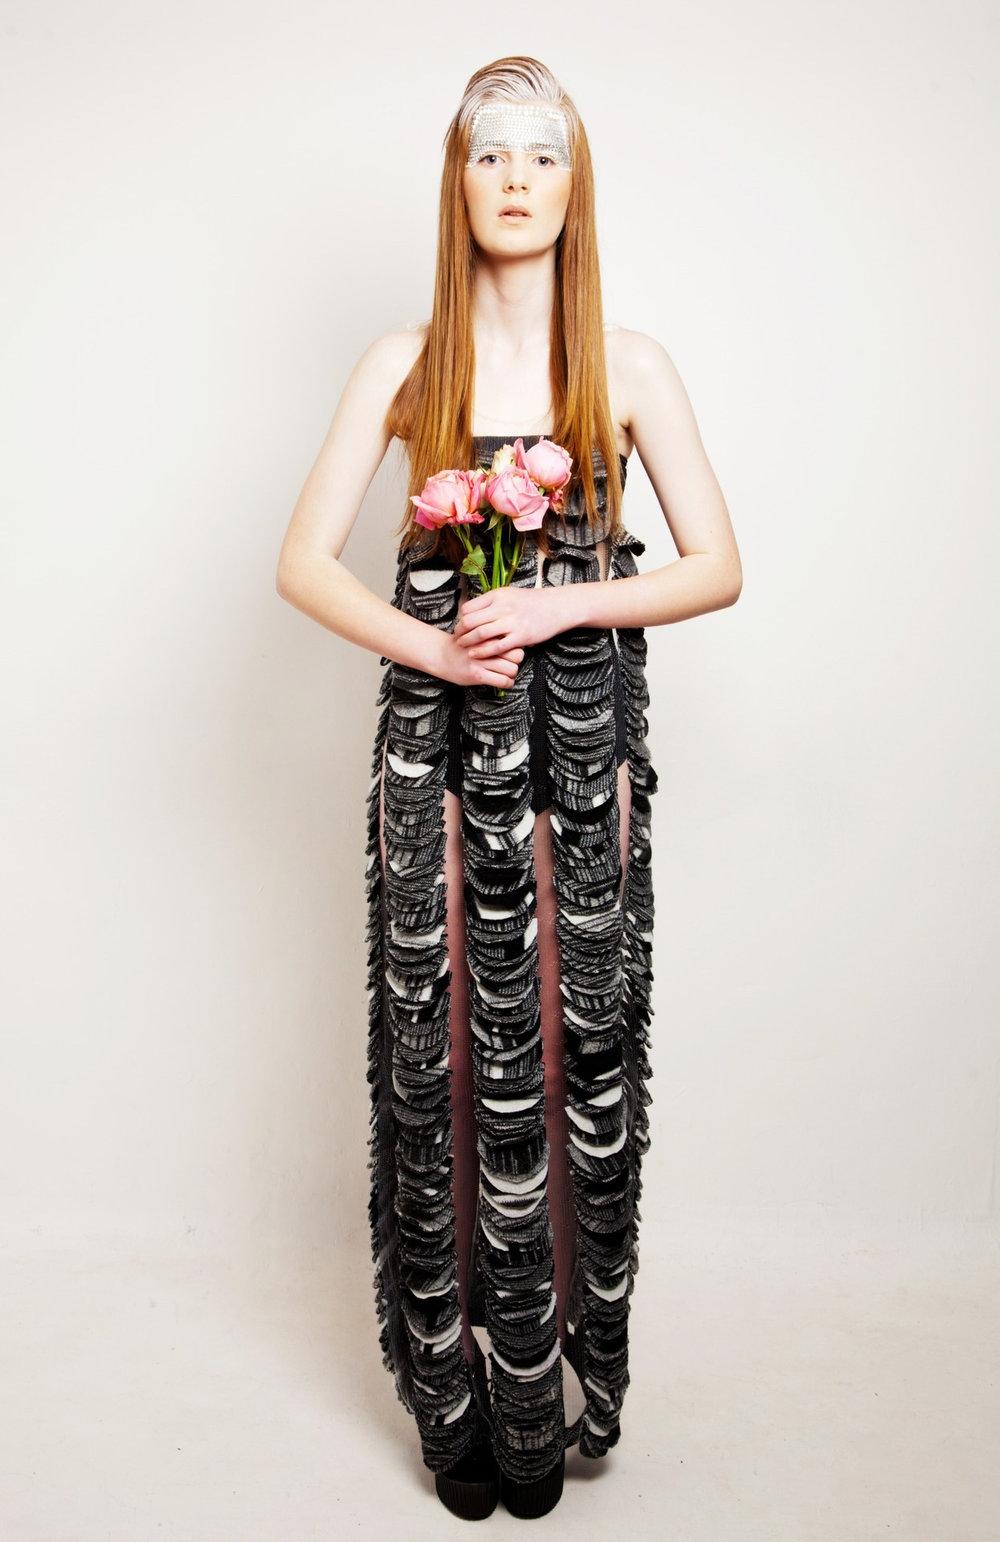 Amber Kingston - image38o.JPG